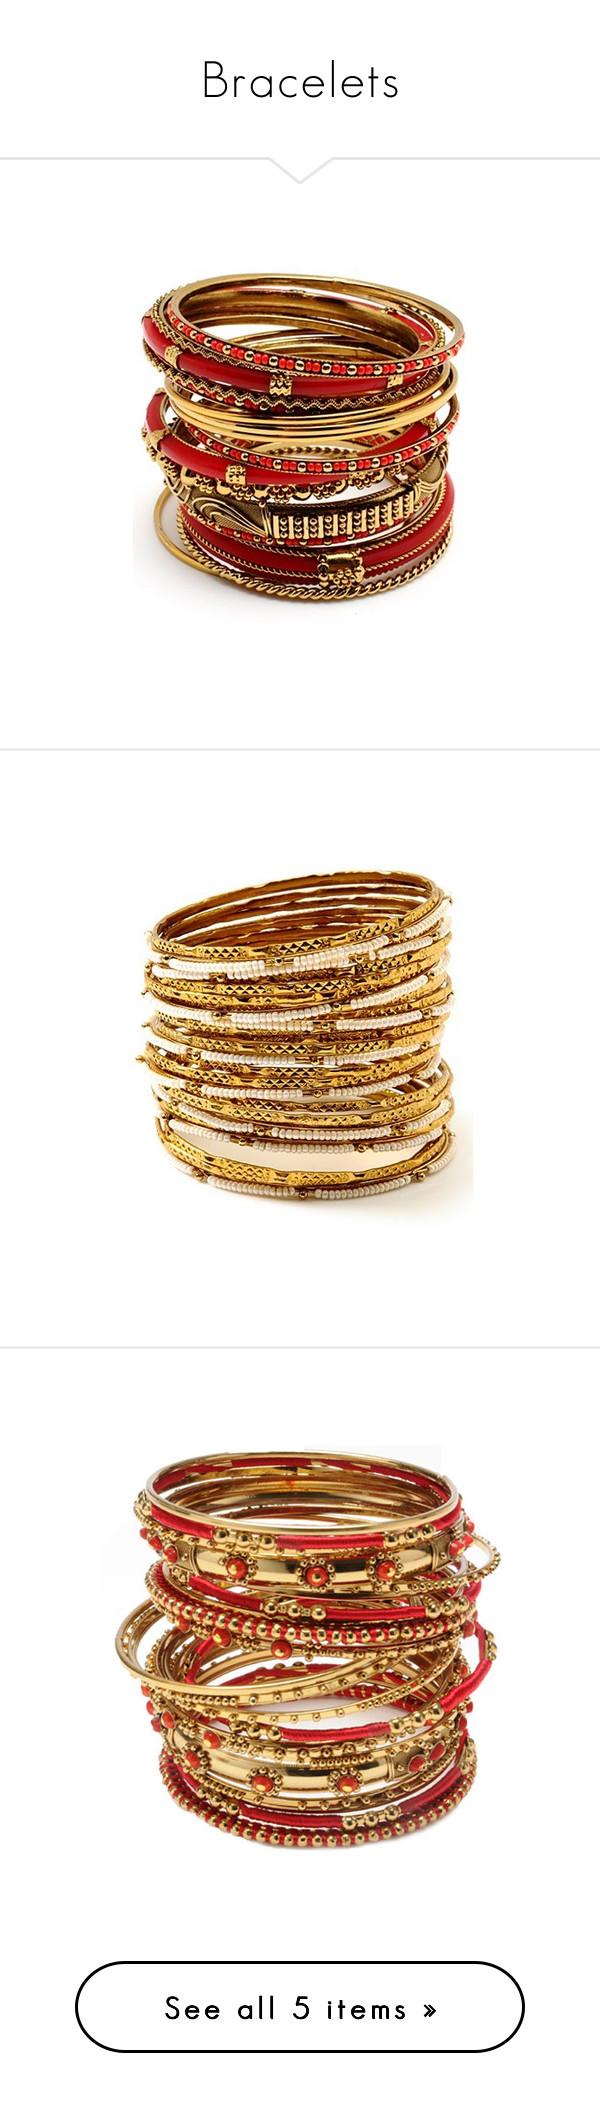 """Bracelets"" by thewearystars ❤ liked on Polyvore featuring jewelry, bracelets, amrita singh, amrita singh jewelry, amrita singh jewellery, amrita singh bangles, bangle bracelet, white bangle, bracelets bangle and bangle jewelry"